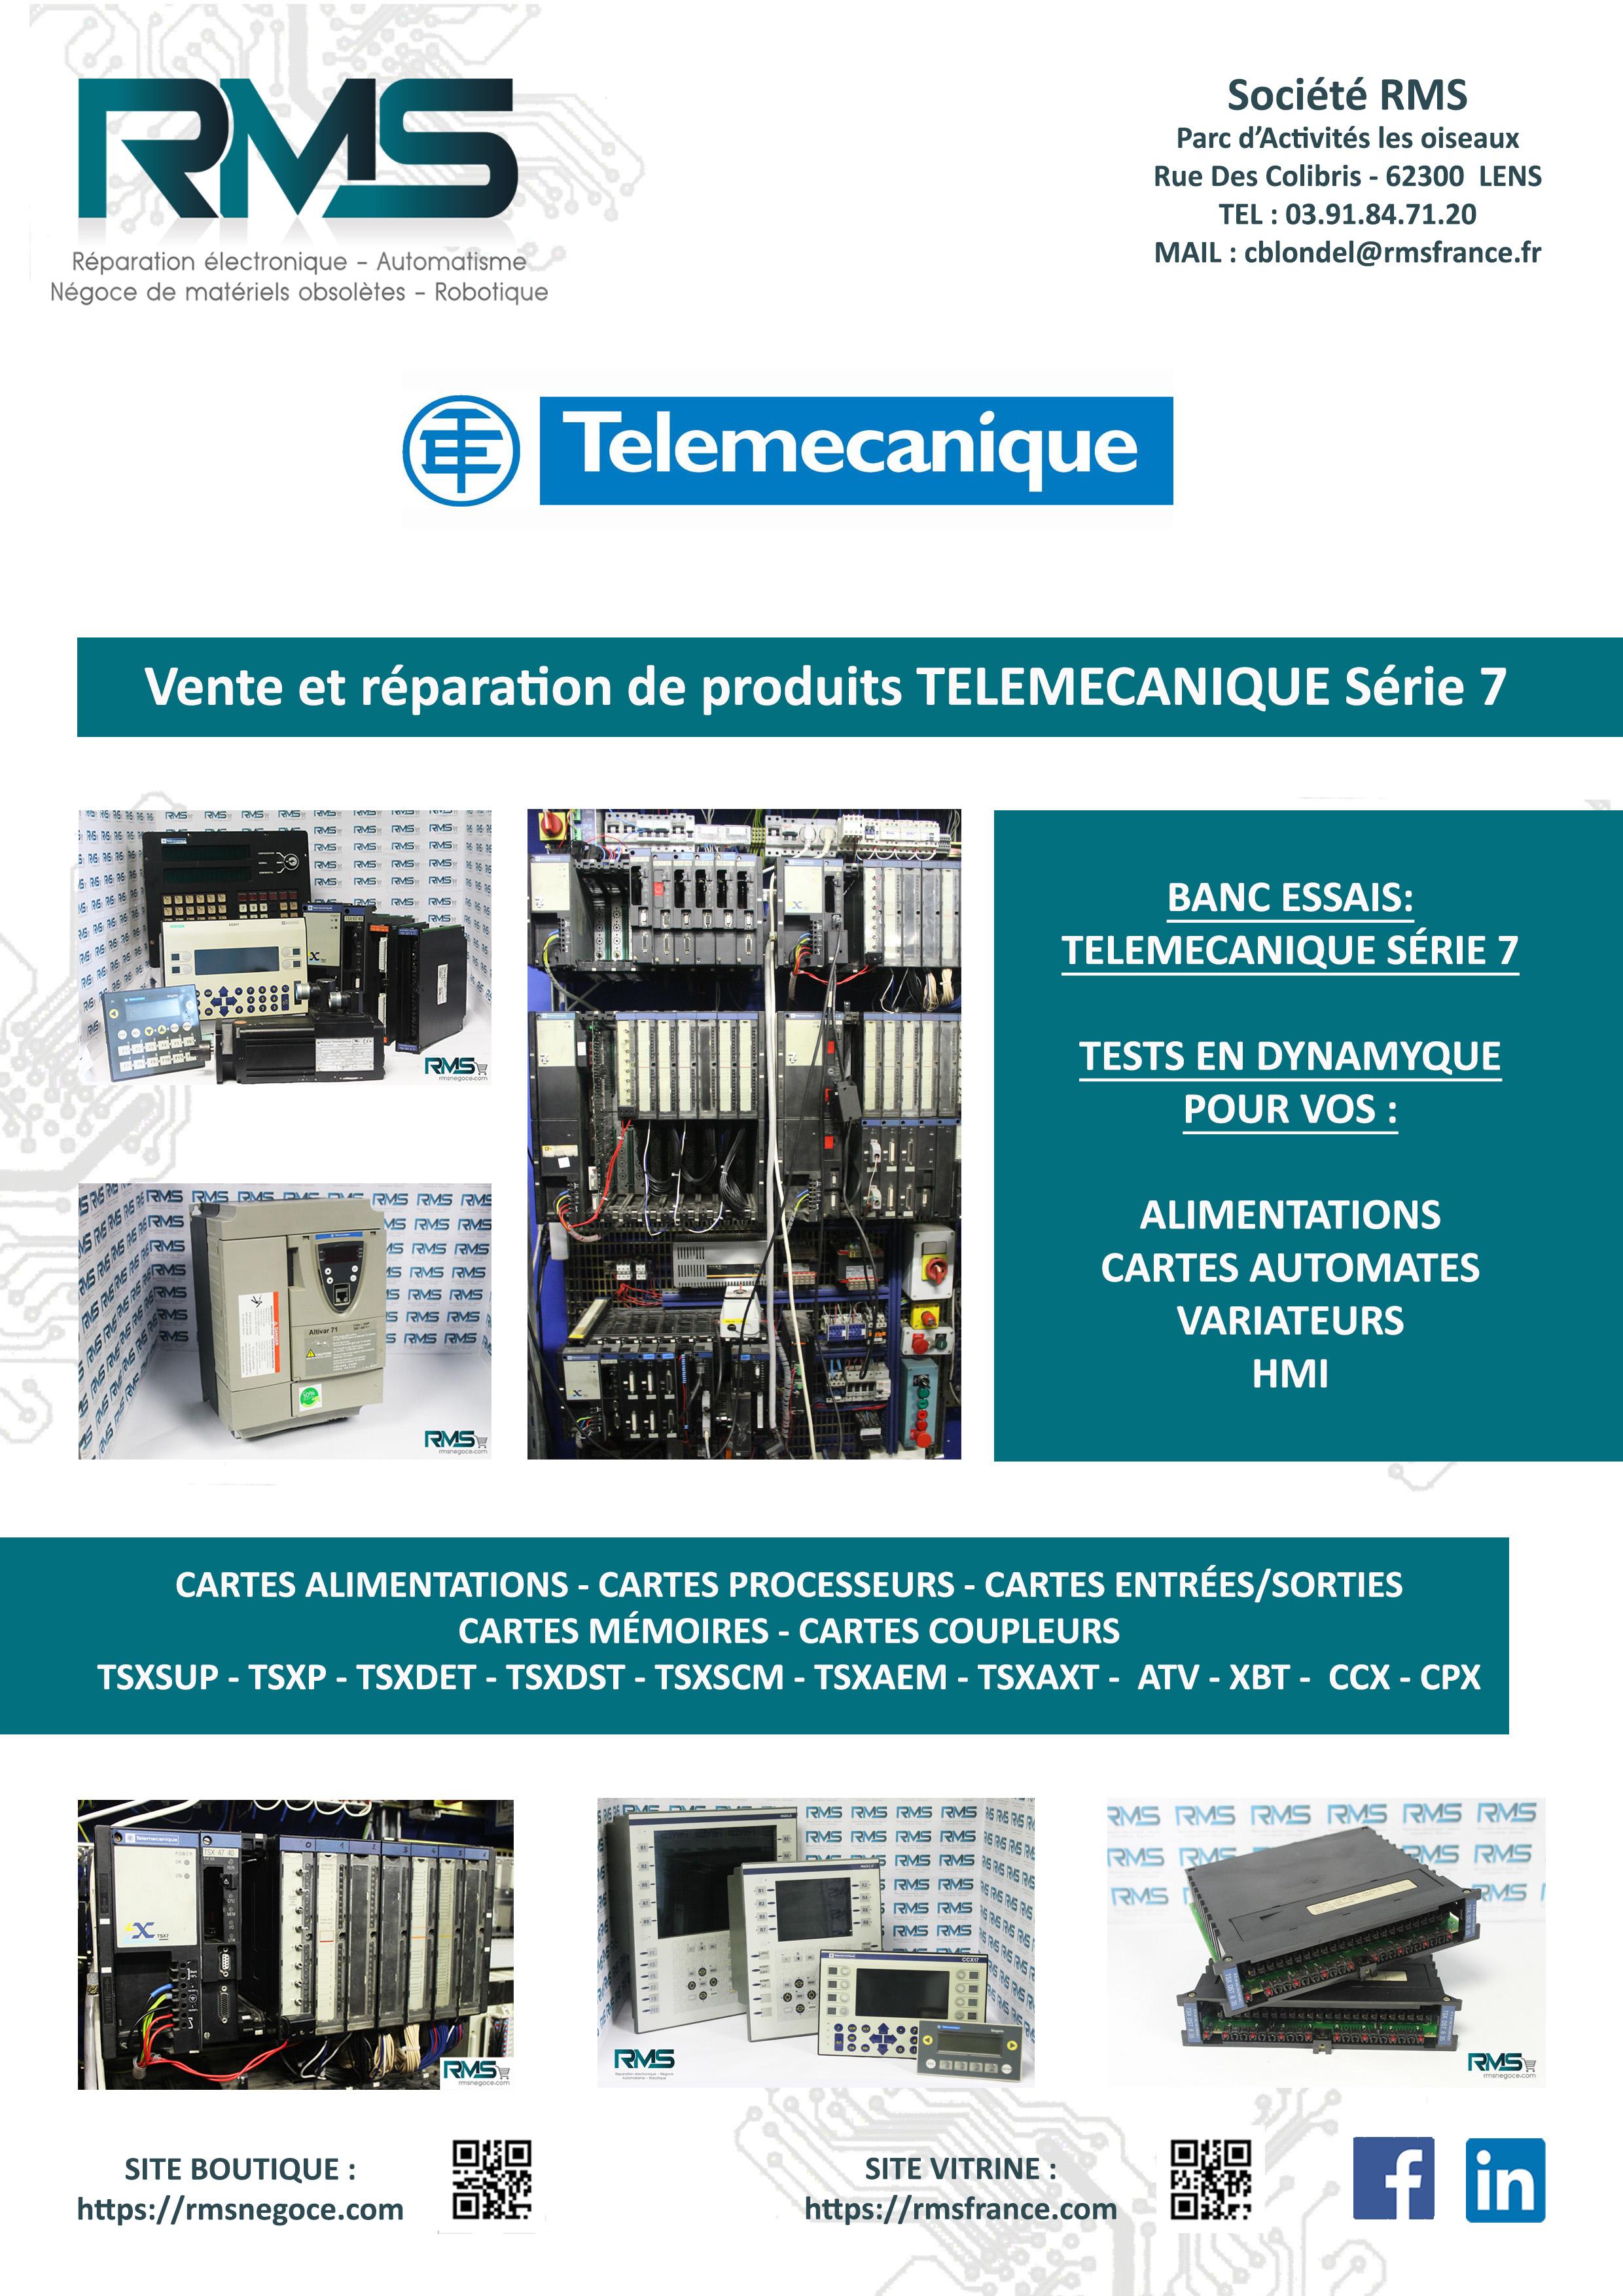 telemecanique - serie 7 - rmsnegoce - vente telemecanique - reparation telemecanique